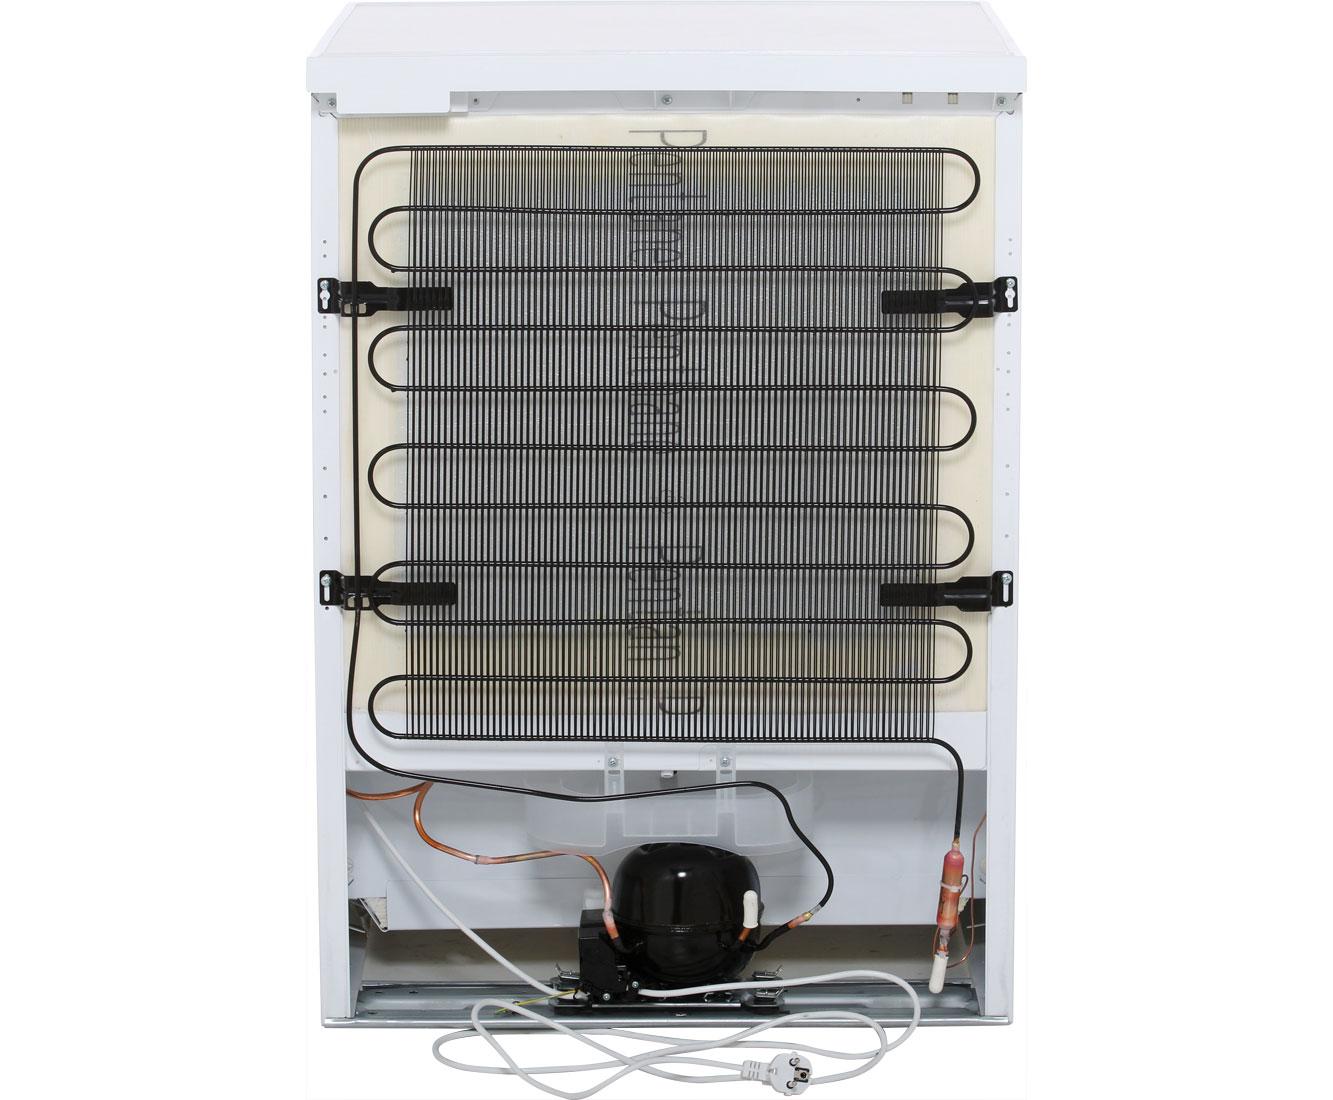 Mini Kühlschrank Gas : Gorenje r aw kühlschrank weiß a